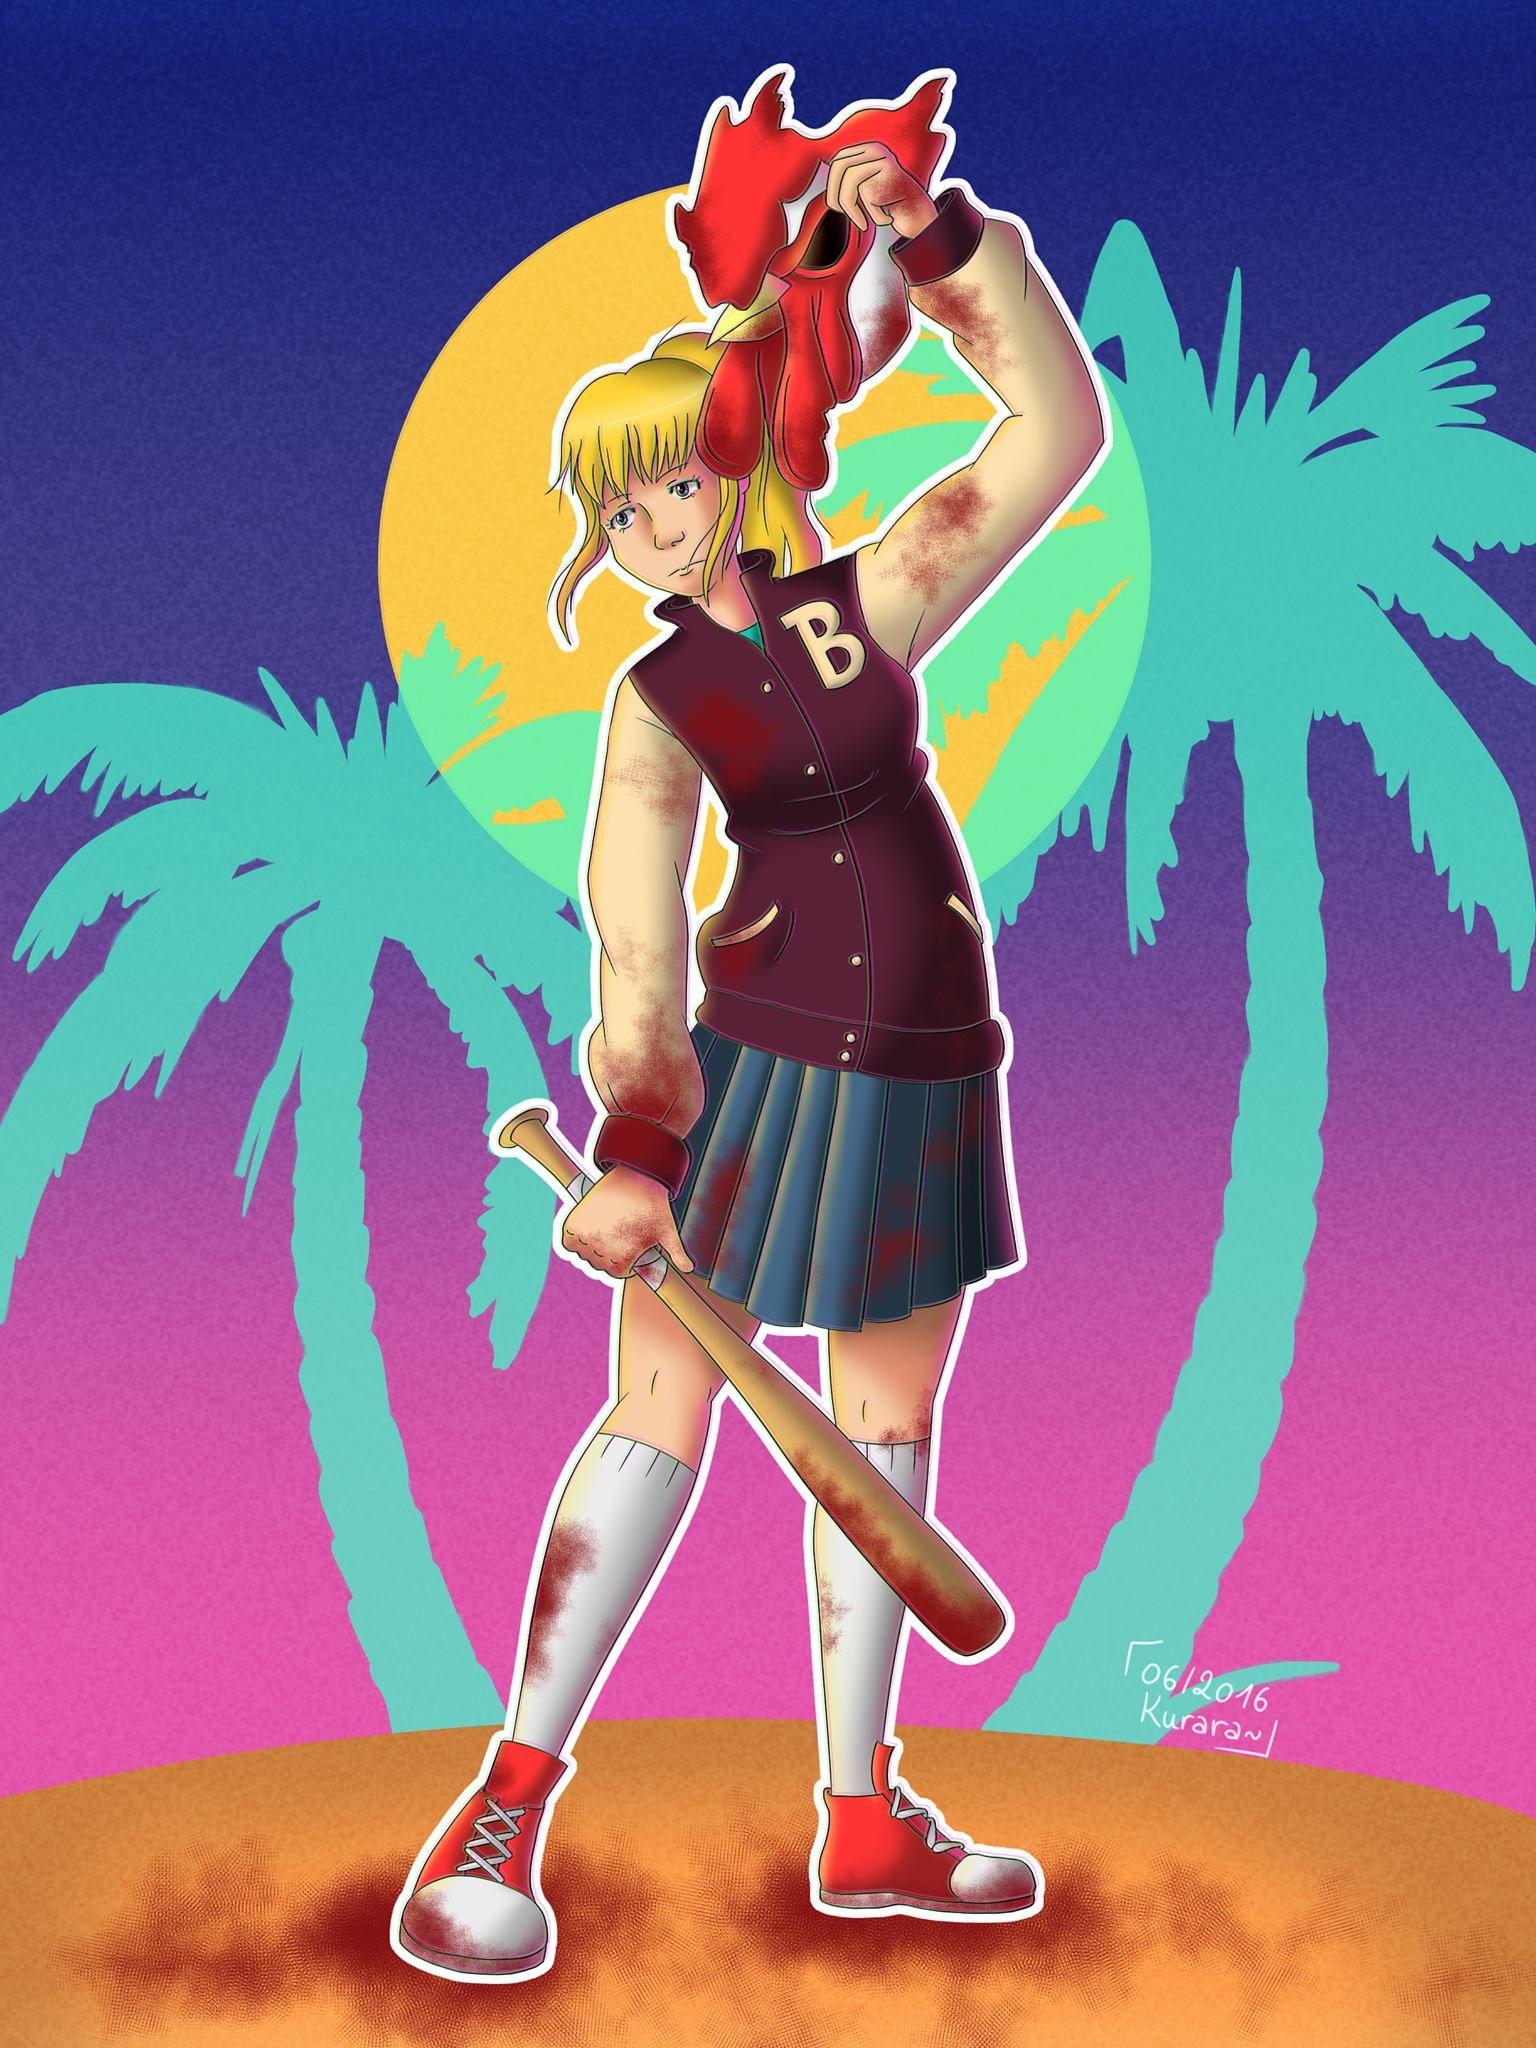 Fanart genderbend of Jacket in Hotline Miami by Kurara~ (https://www.facebook.com/KuraraPage/)